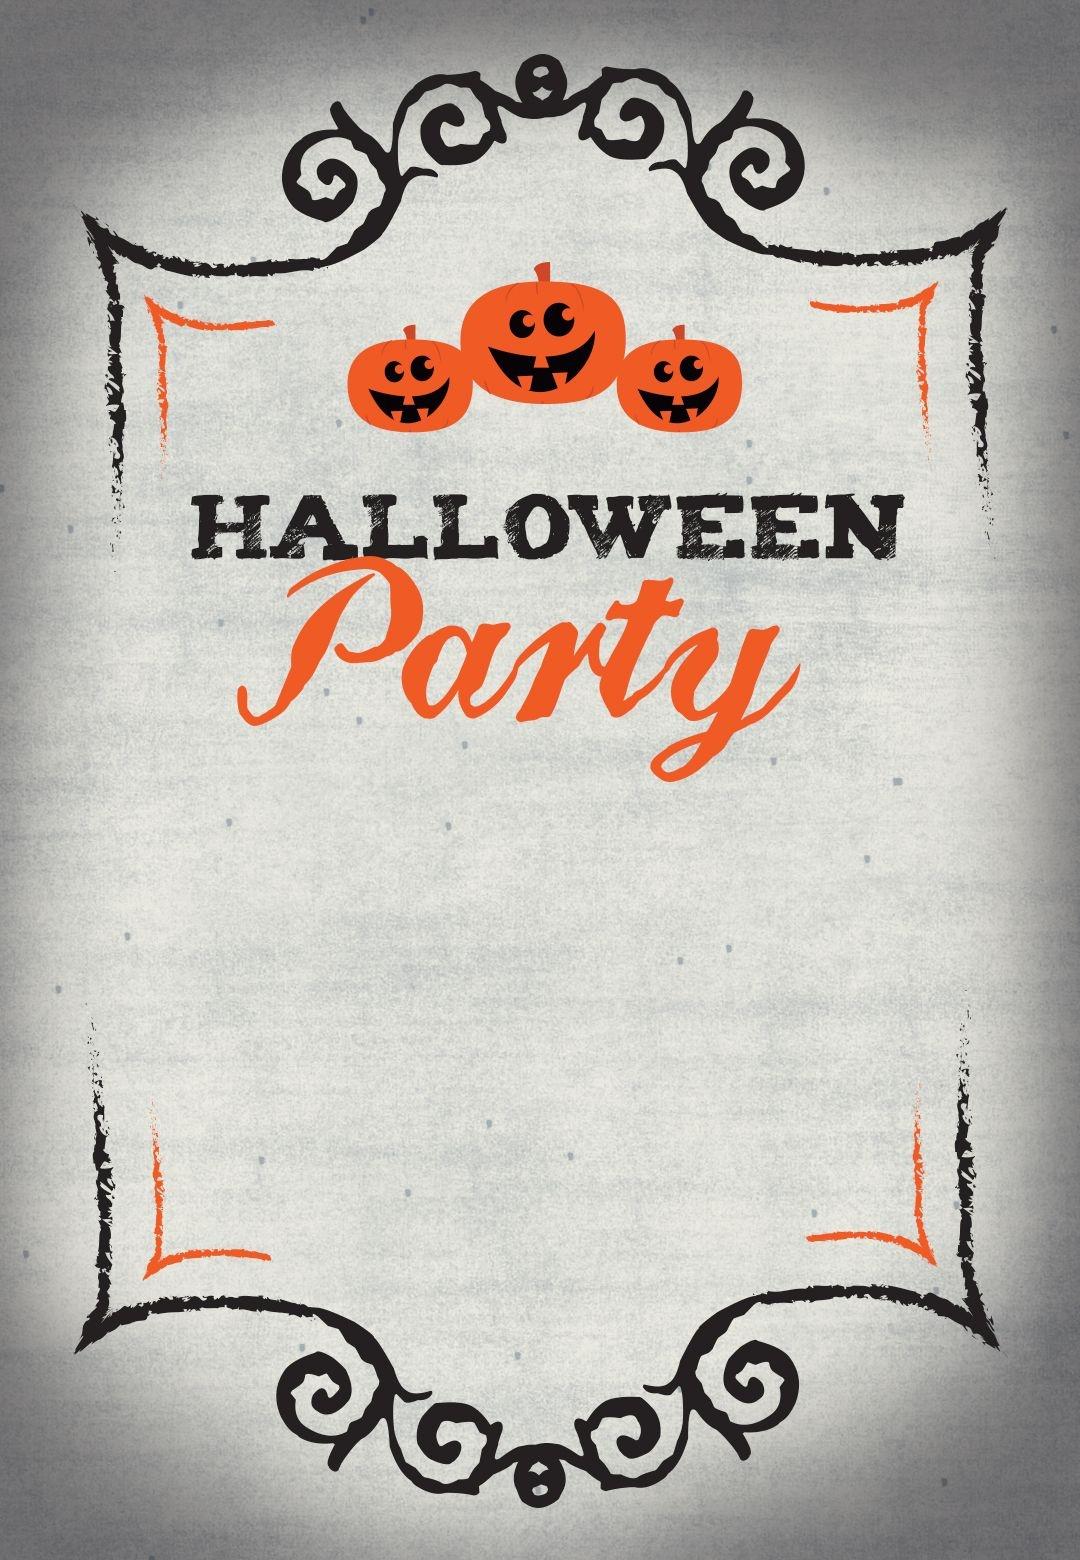 Halloween Party - Free Printable Halloween Invitation Template - Halloween Party Invitation Templates Free Printable